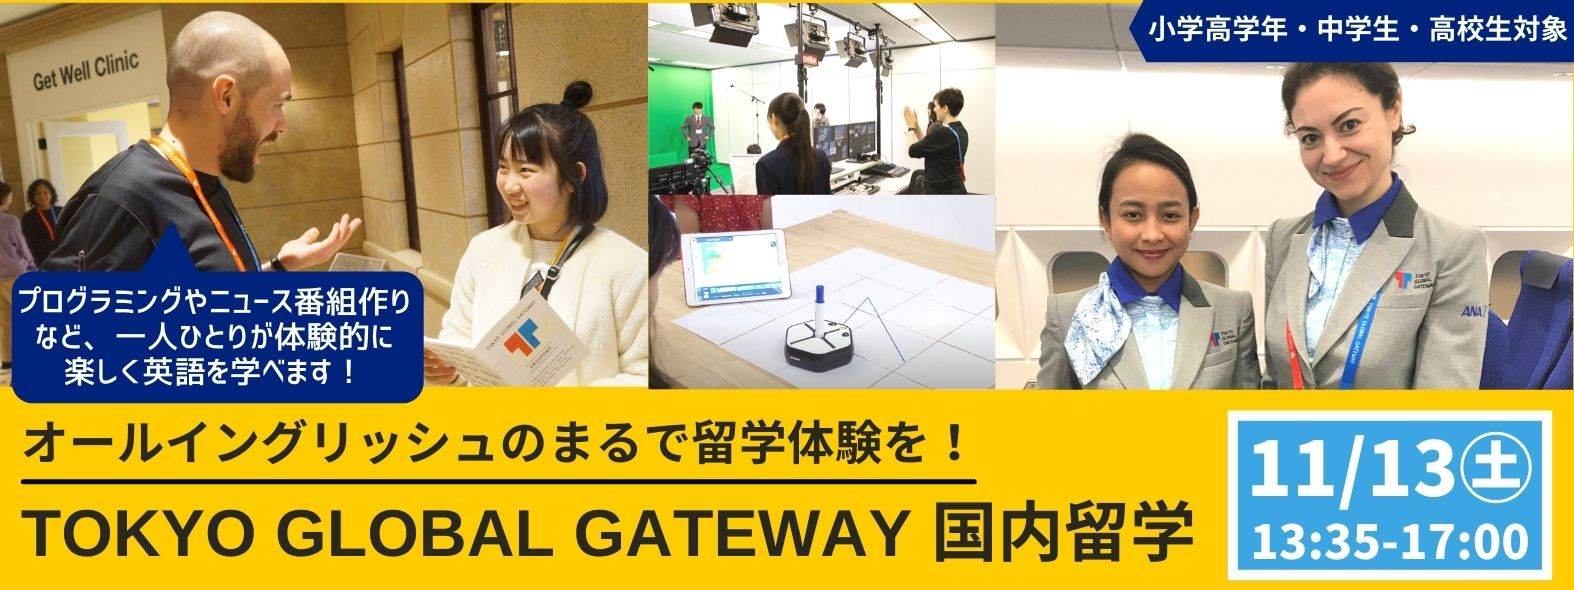 国内留学 in TOKYO GLOBAL GATEWAY(TGG)